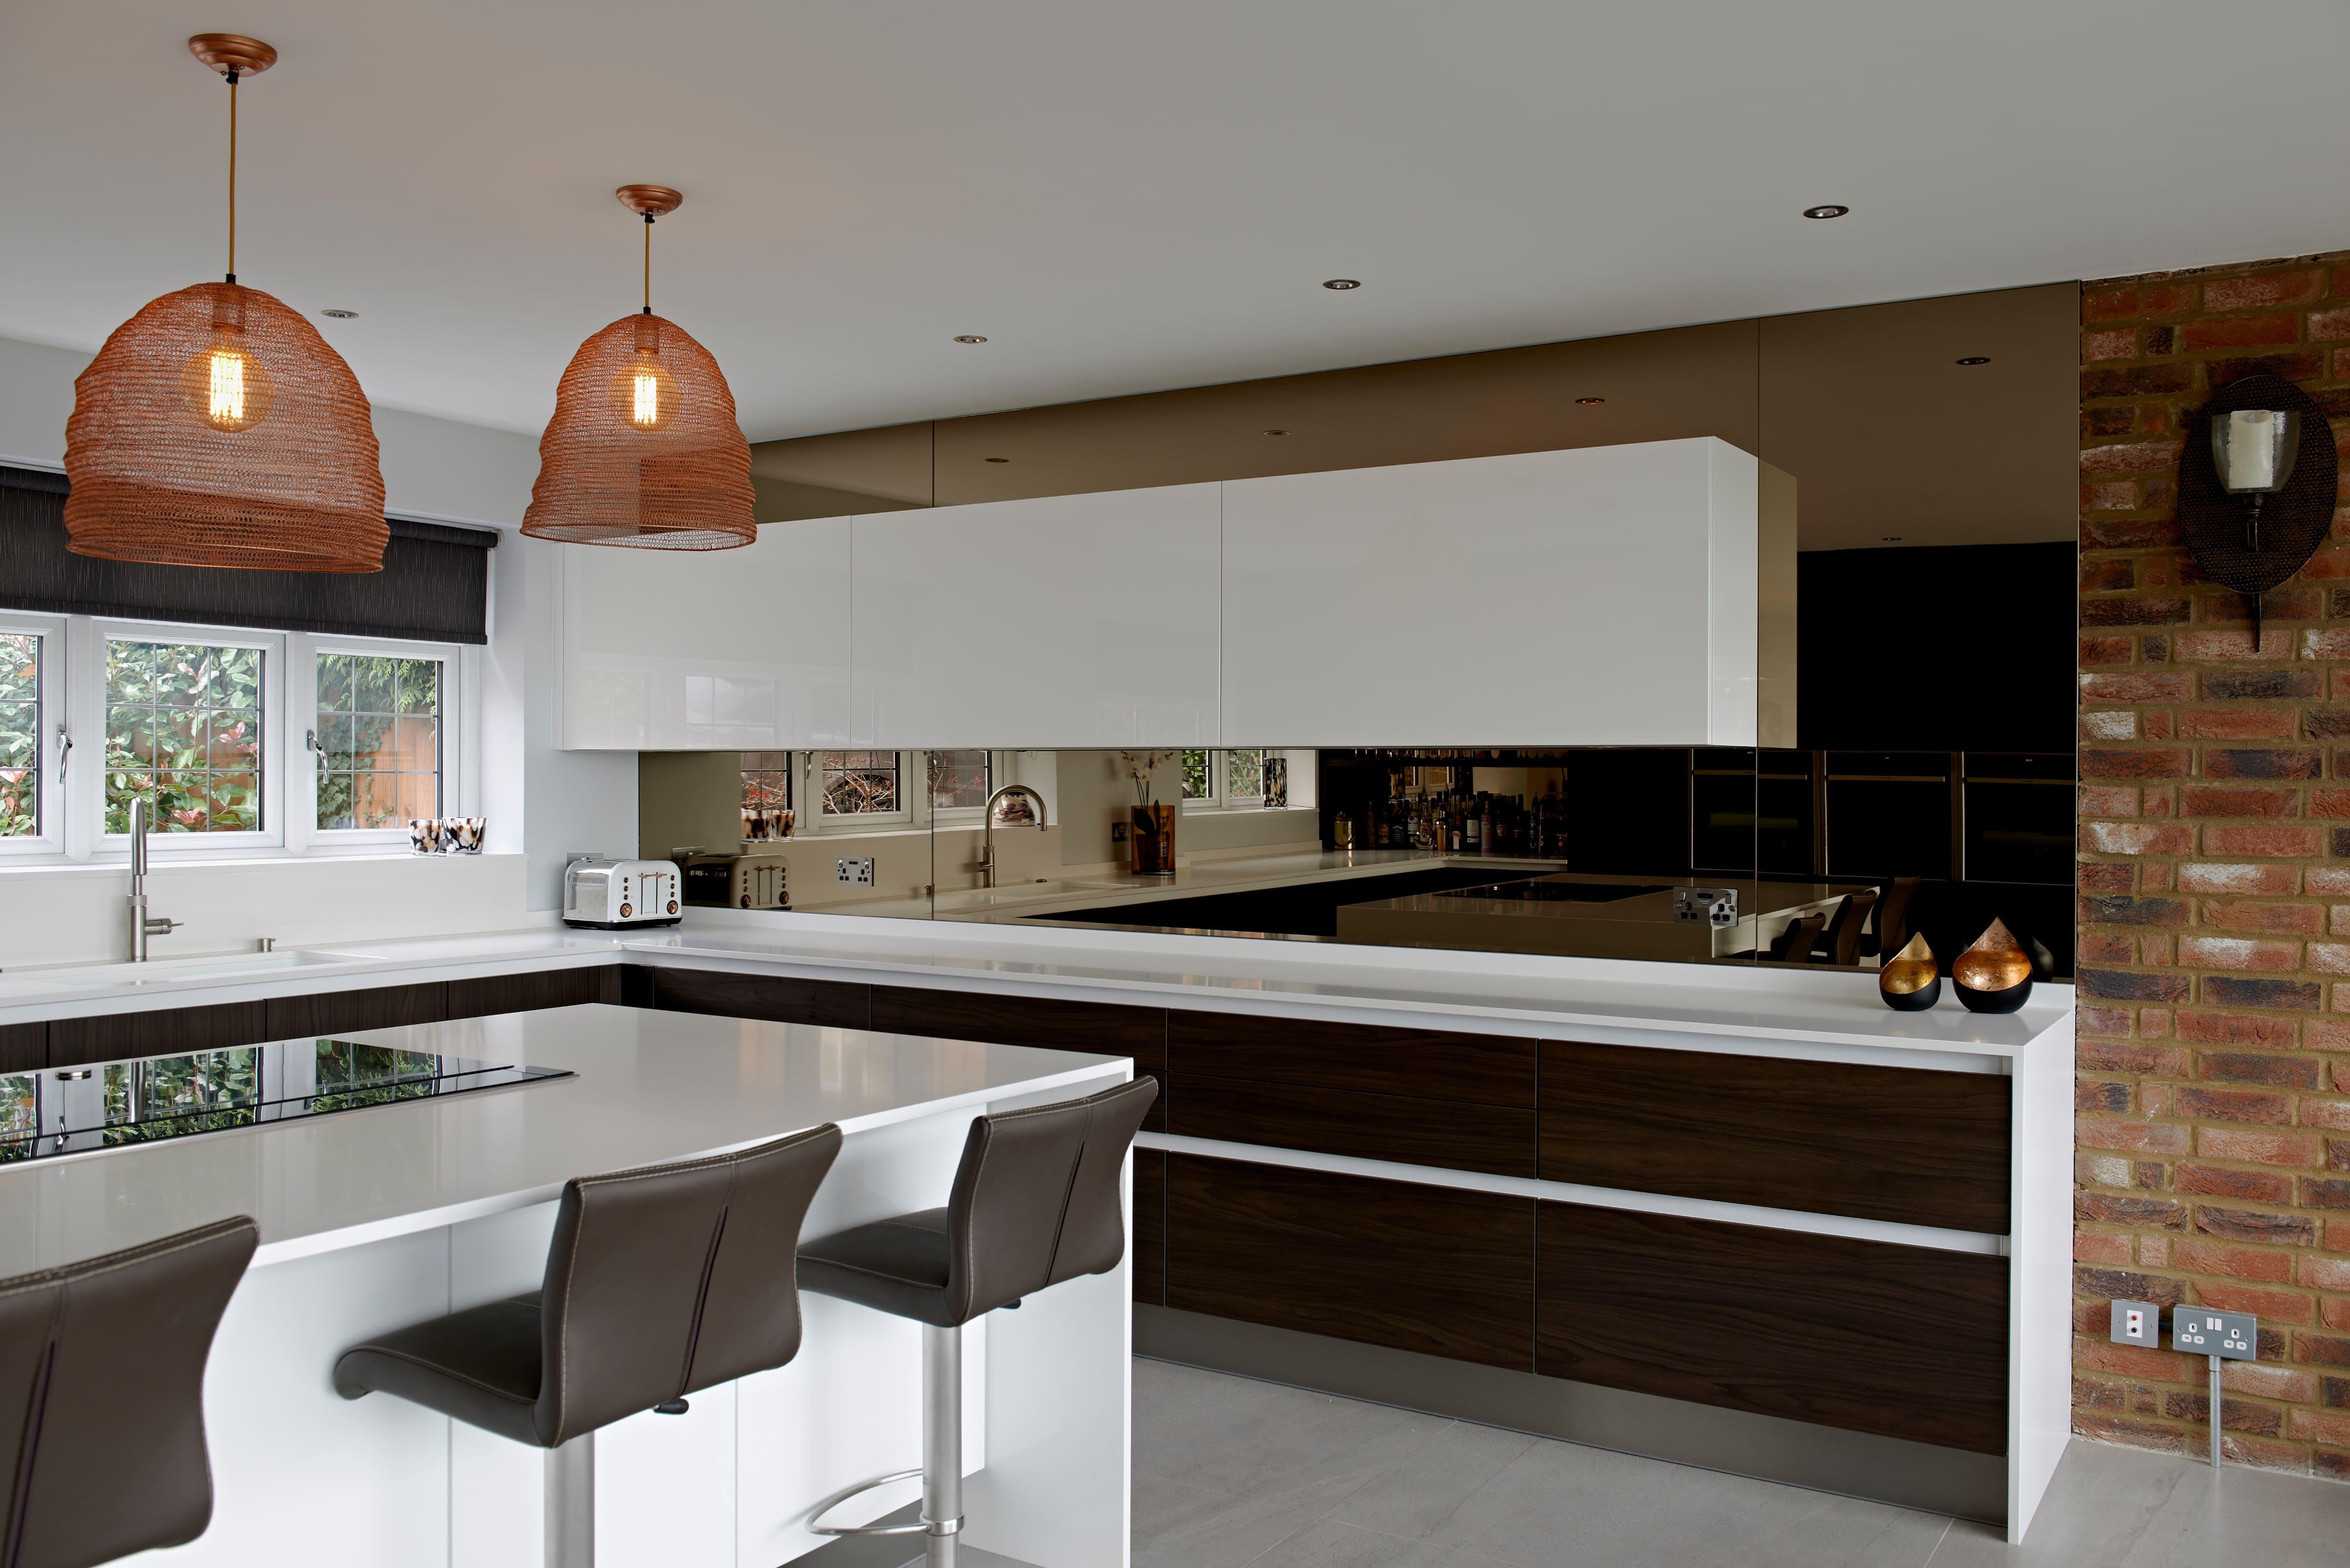 https://www.designer-kitchens.co.uk/wp-content/uploads/2019/10/PETERSWOODHILL-35149.jpg